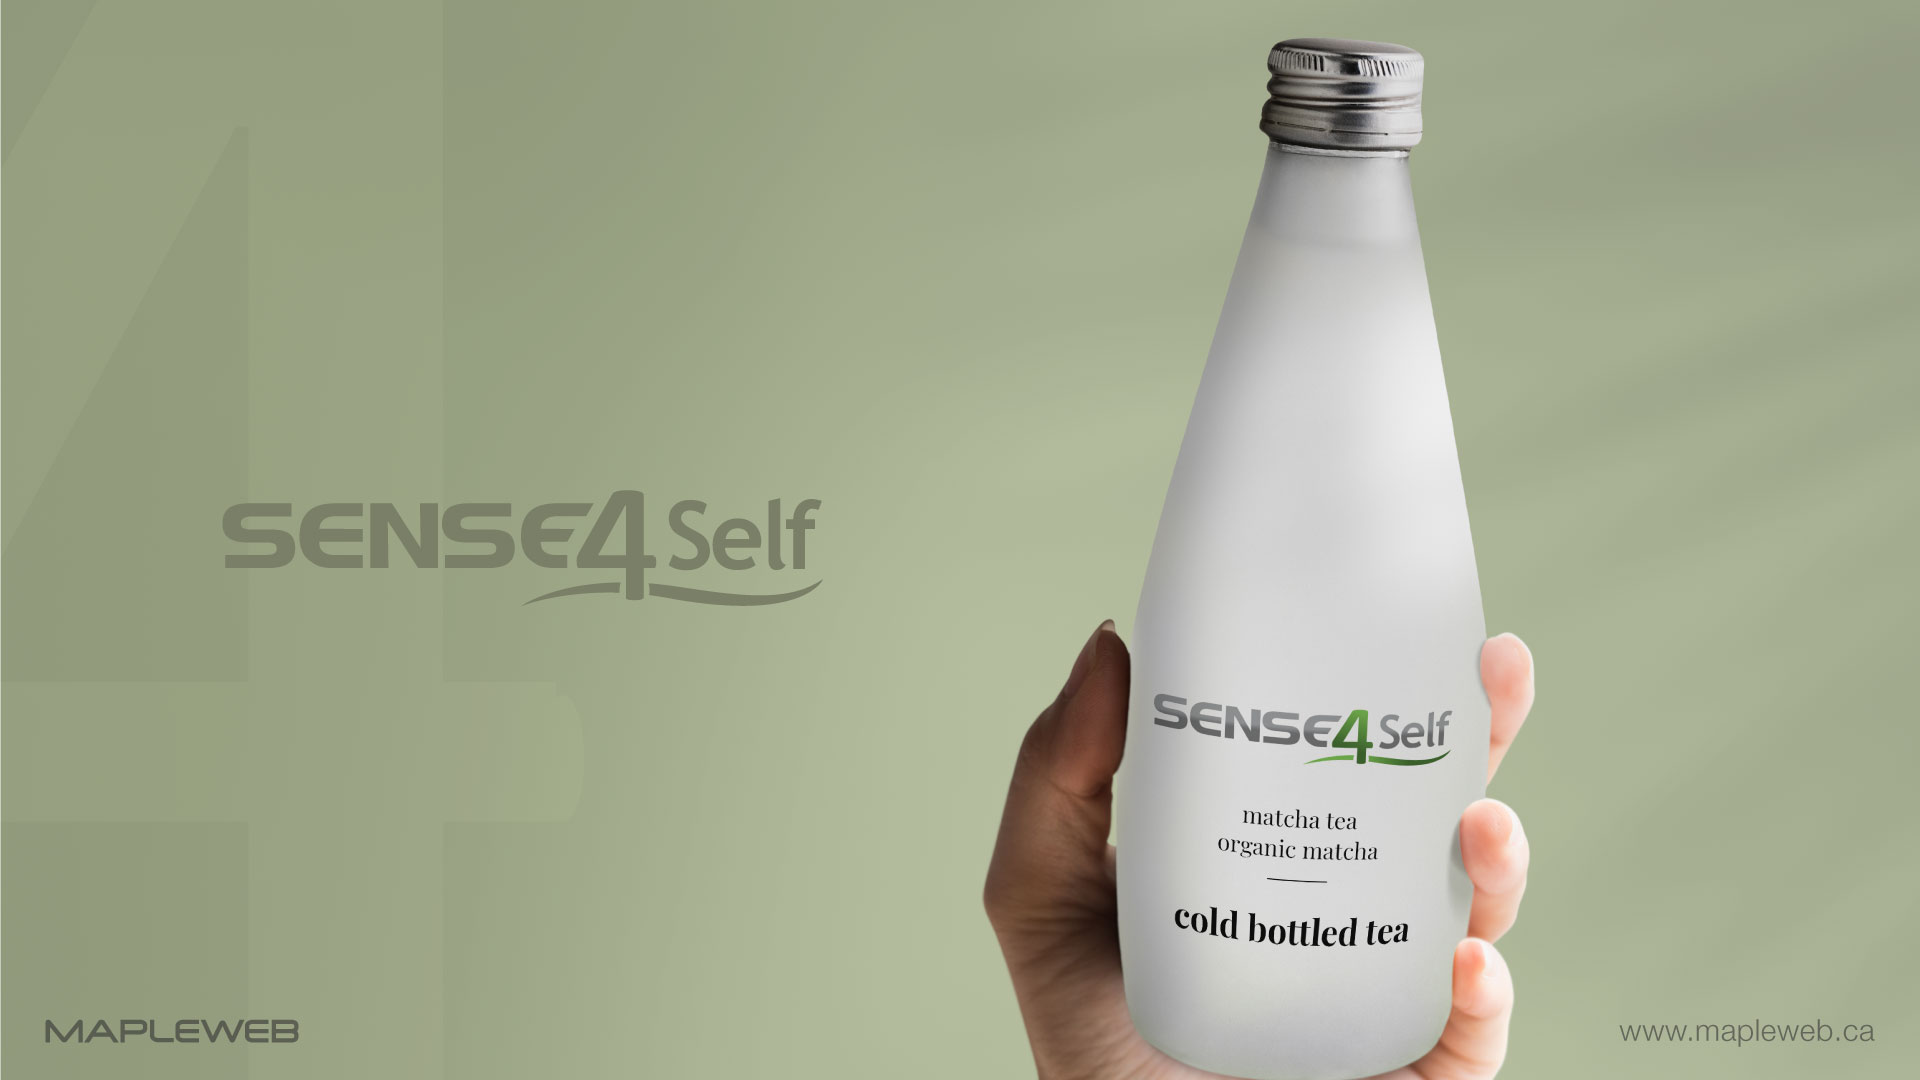 sense-4-self-brand-logo-design-by-mapleweb-vancouver-canada-wine-bottle-mock